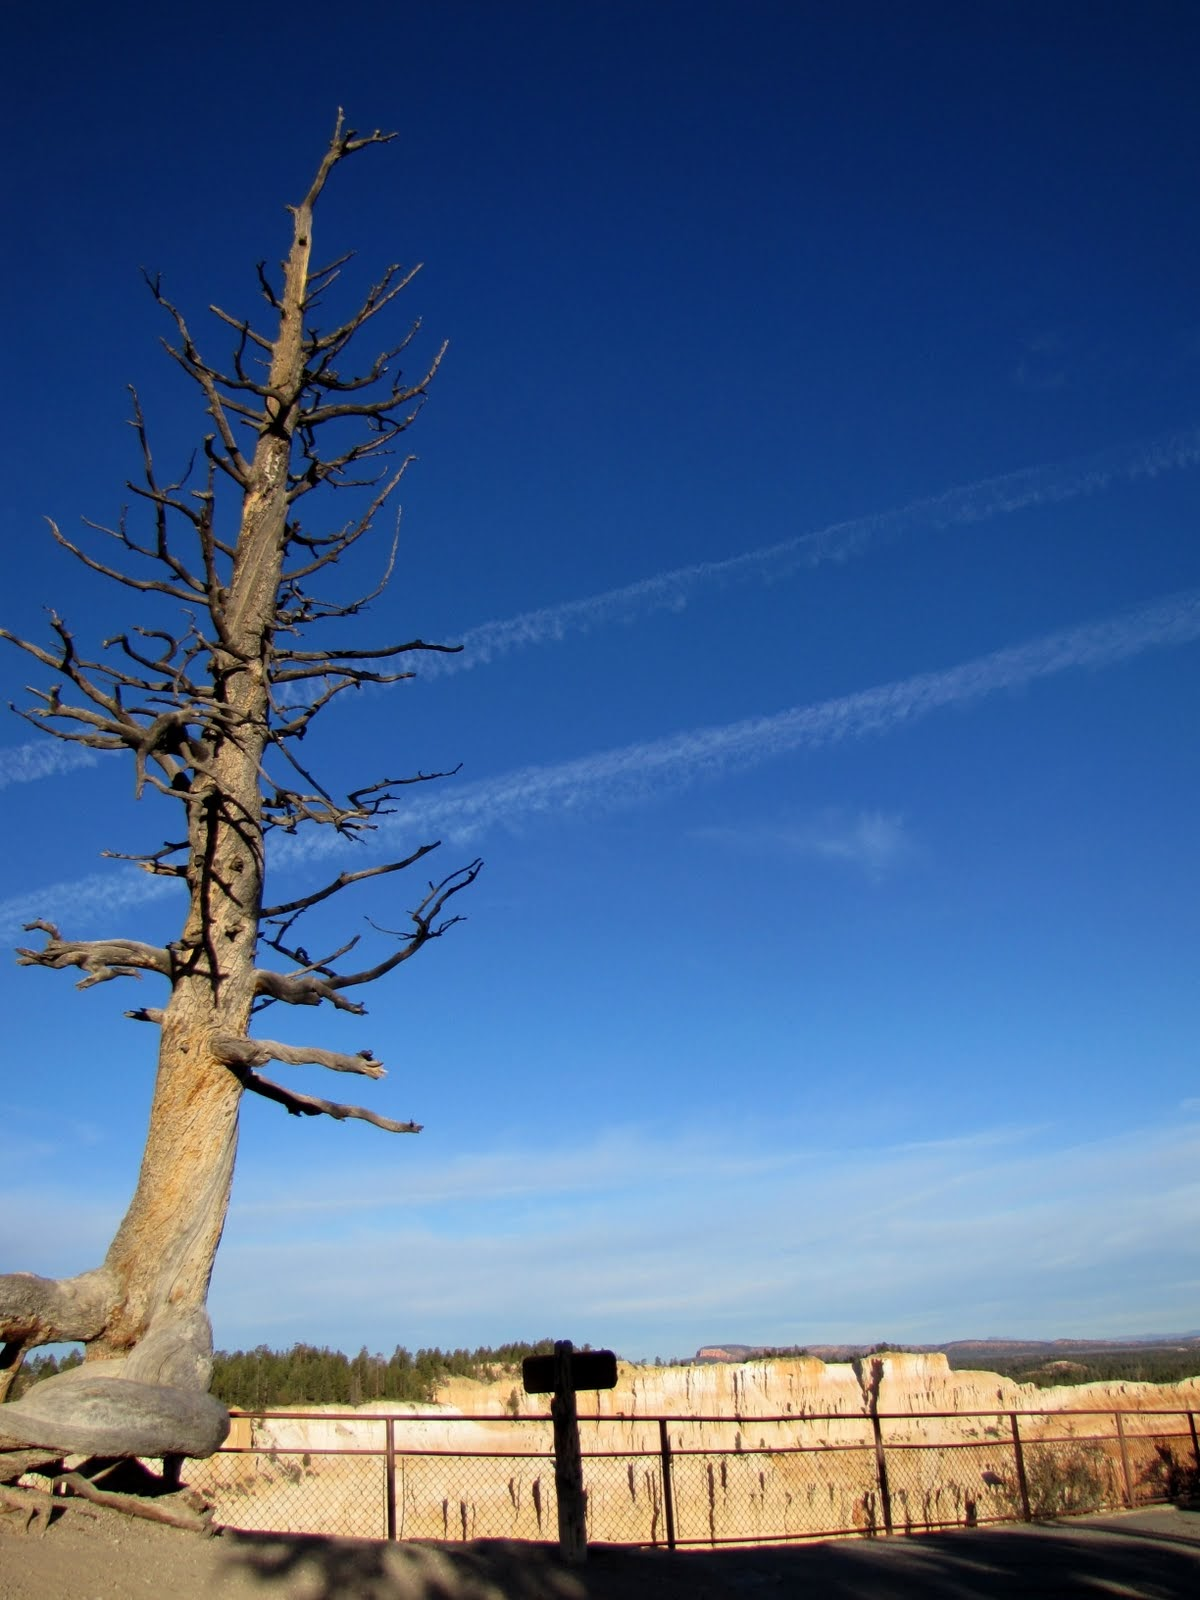 Levitating Tree